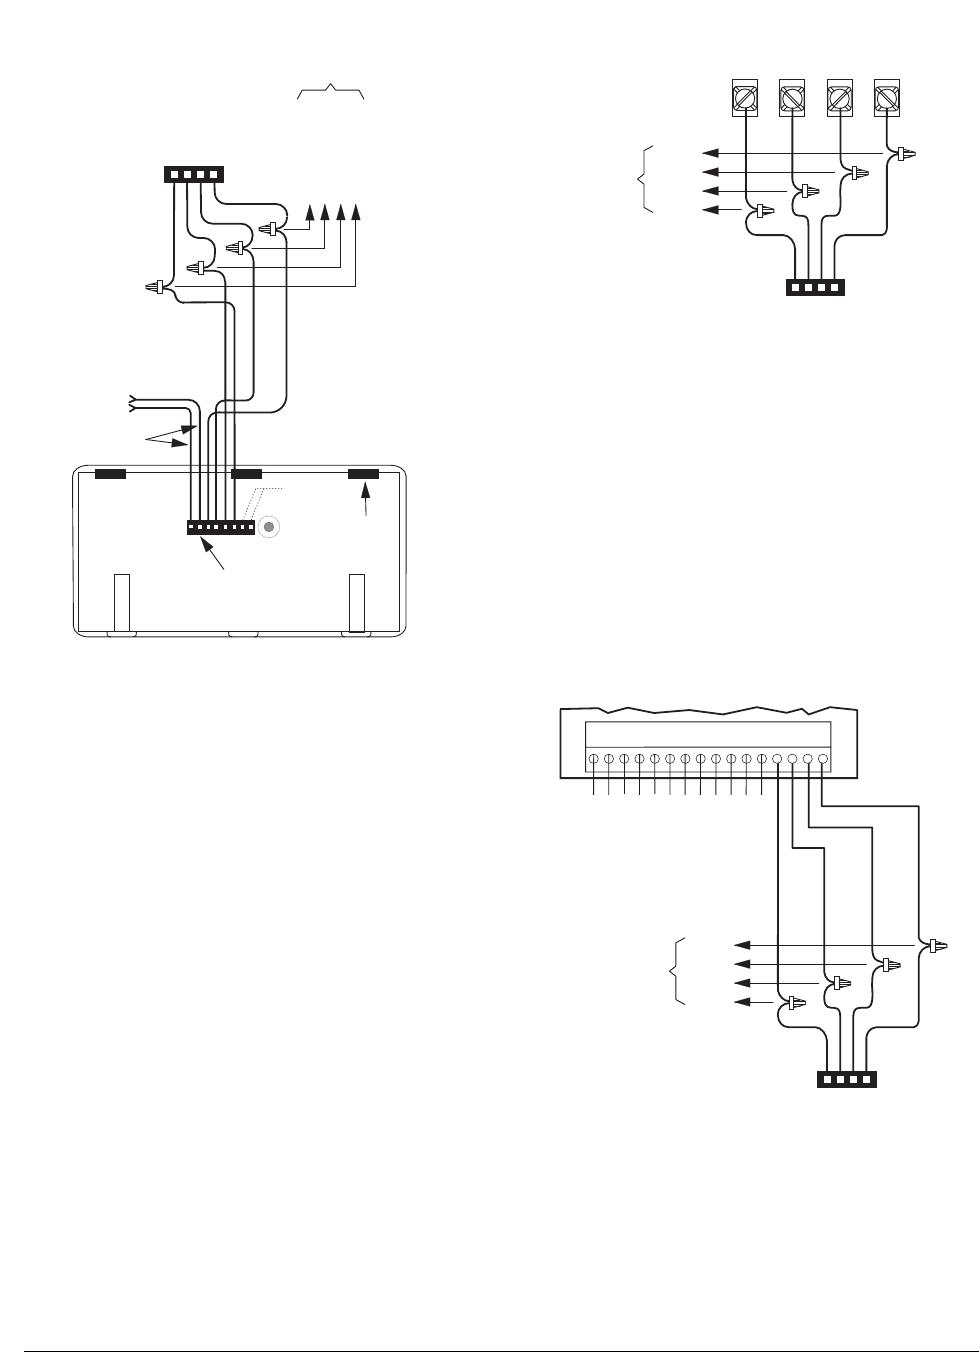 Generous Rj31x Wiring Diagram Images - Wiring Diagram Ideas ...